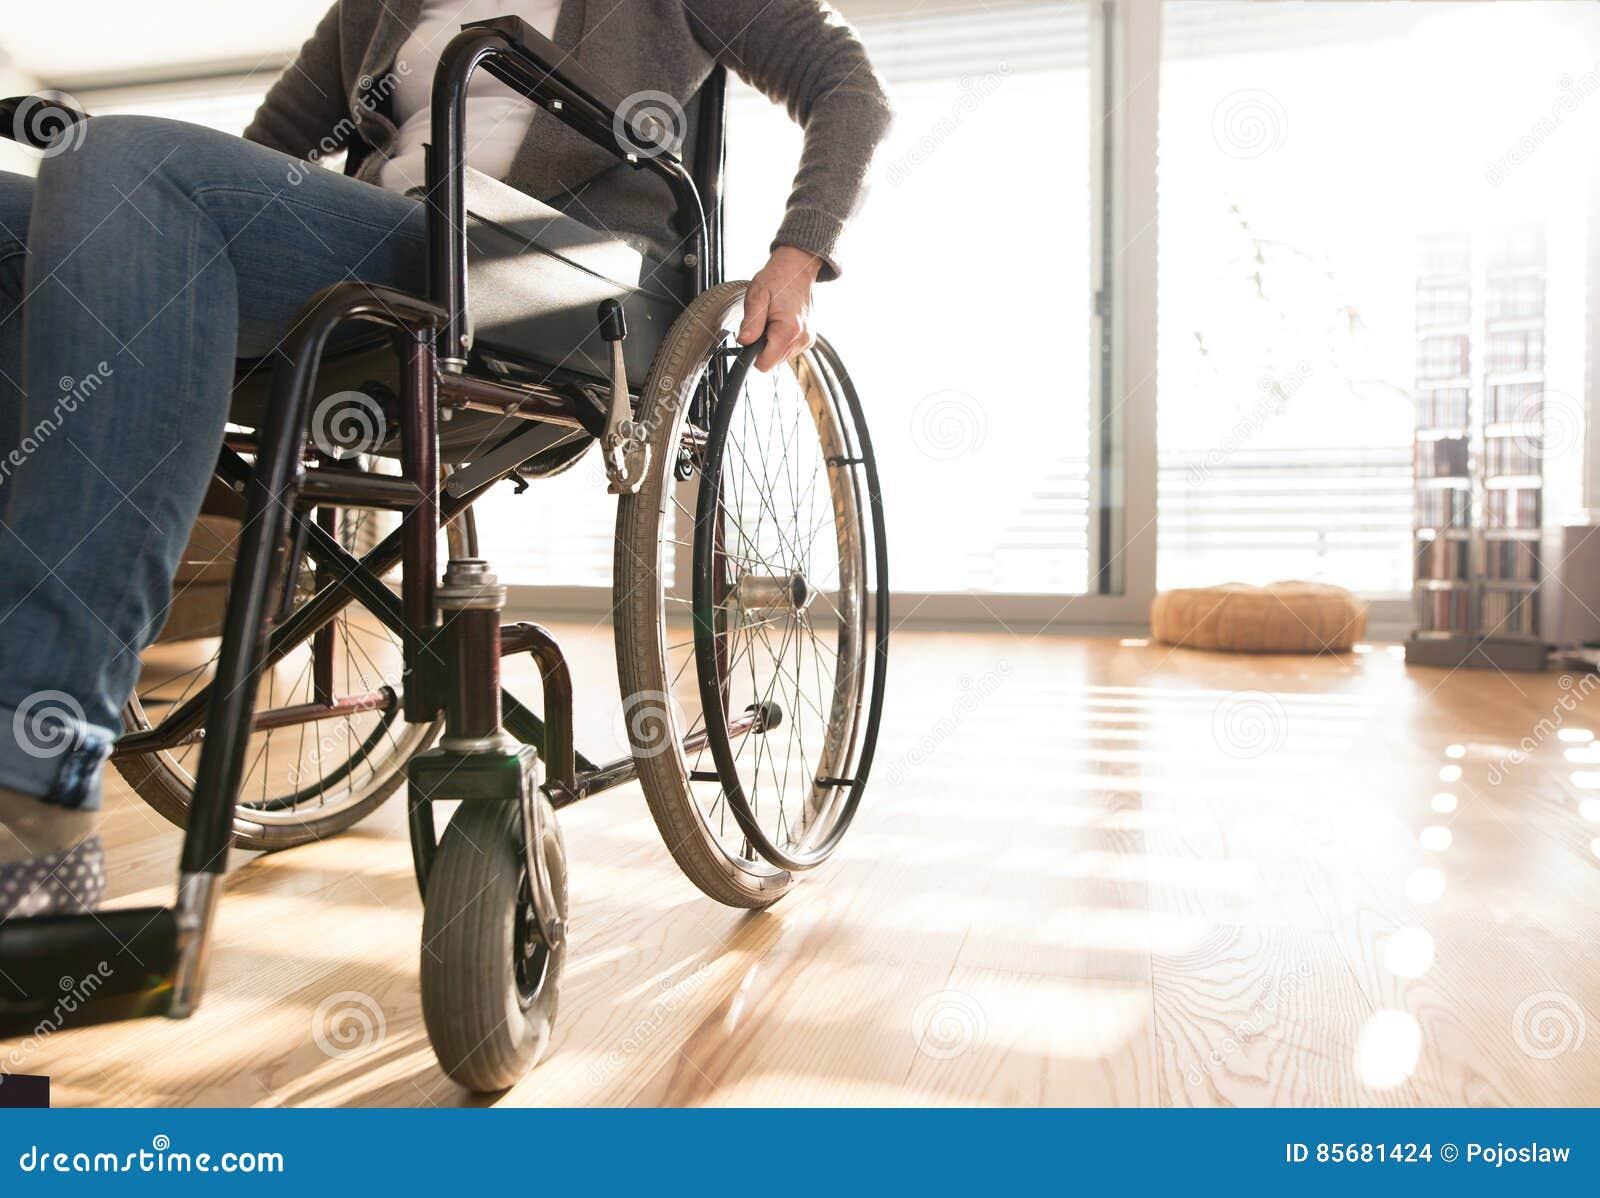 Unrecognizable με ειδικές ανάγκες ανώτερη γυναίκα στην αναπηρική καρέκλα στο σπίτι